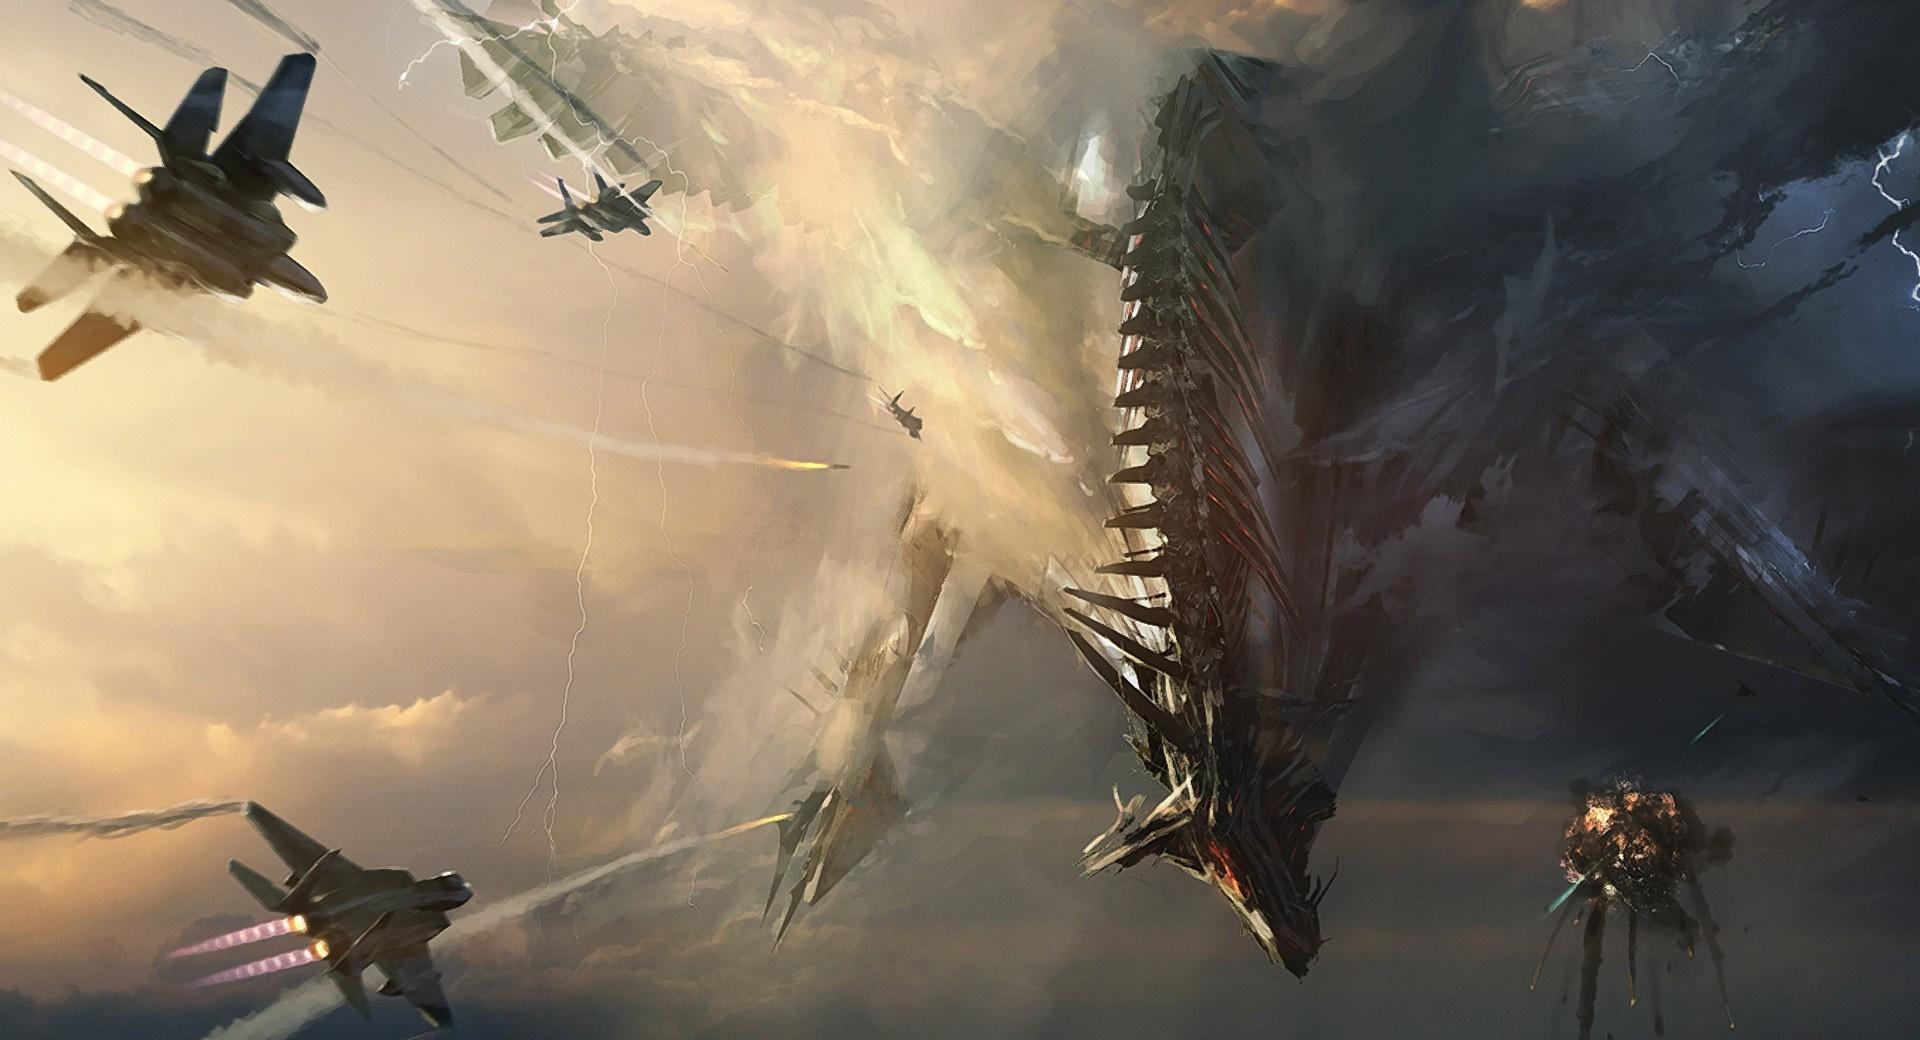 Sci-Fi Dragon wallpapers HD quality